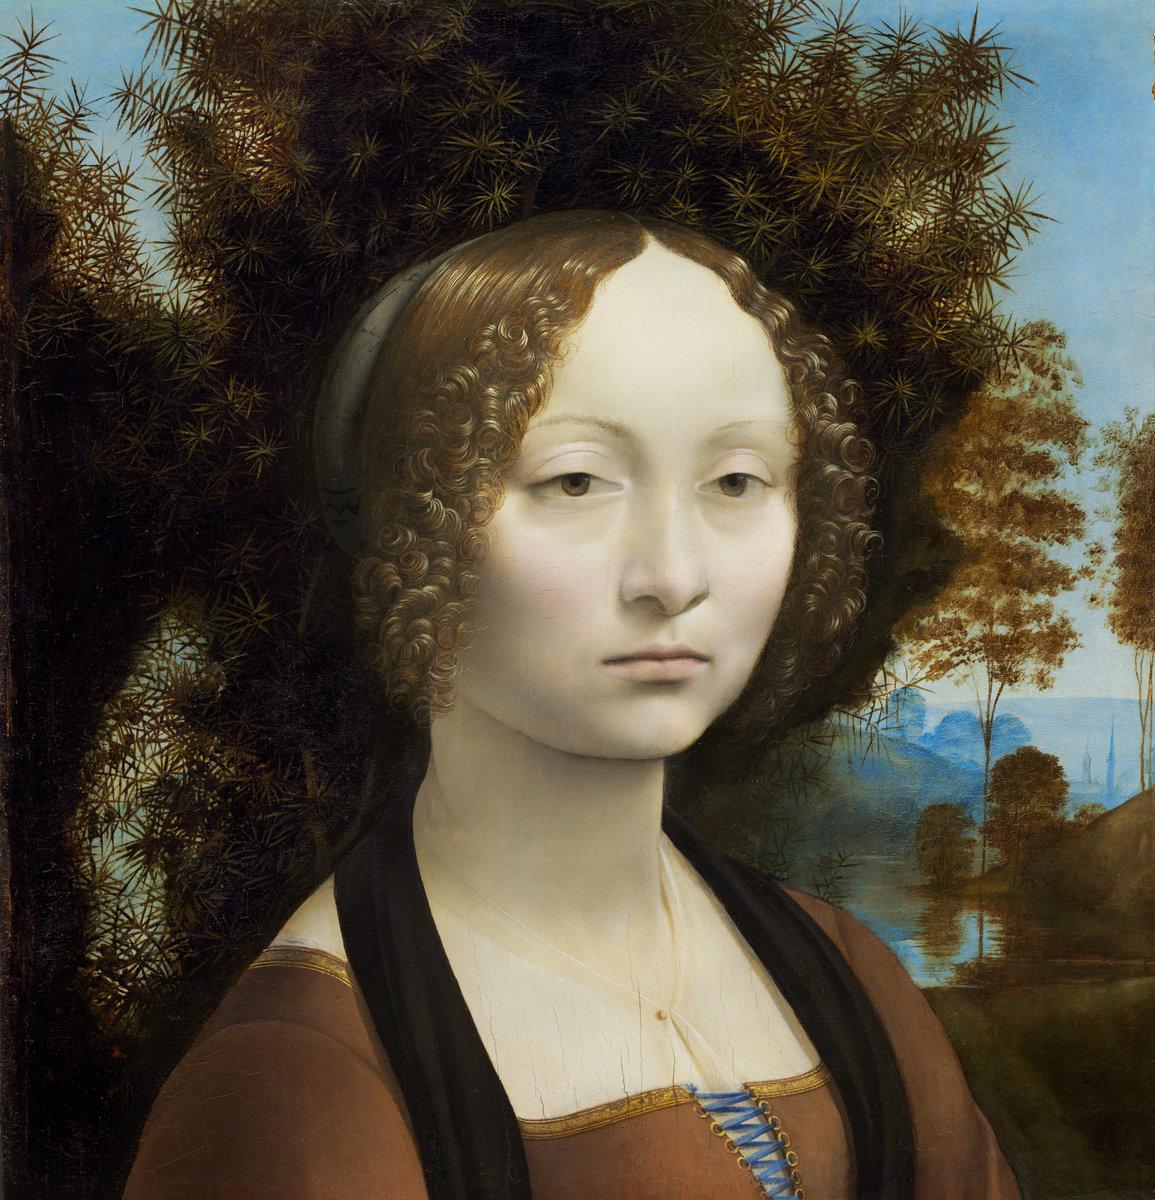 Leonardo da Vinci (Italian, 1452 - 1519 ), Ginevra de' Benci [obverse], c. 1474/1478, oil on panel. Washington, National Gallery, Ailsa Mellon Bruce Fund